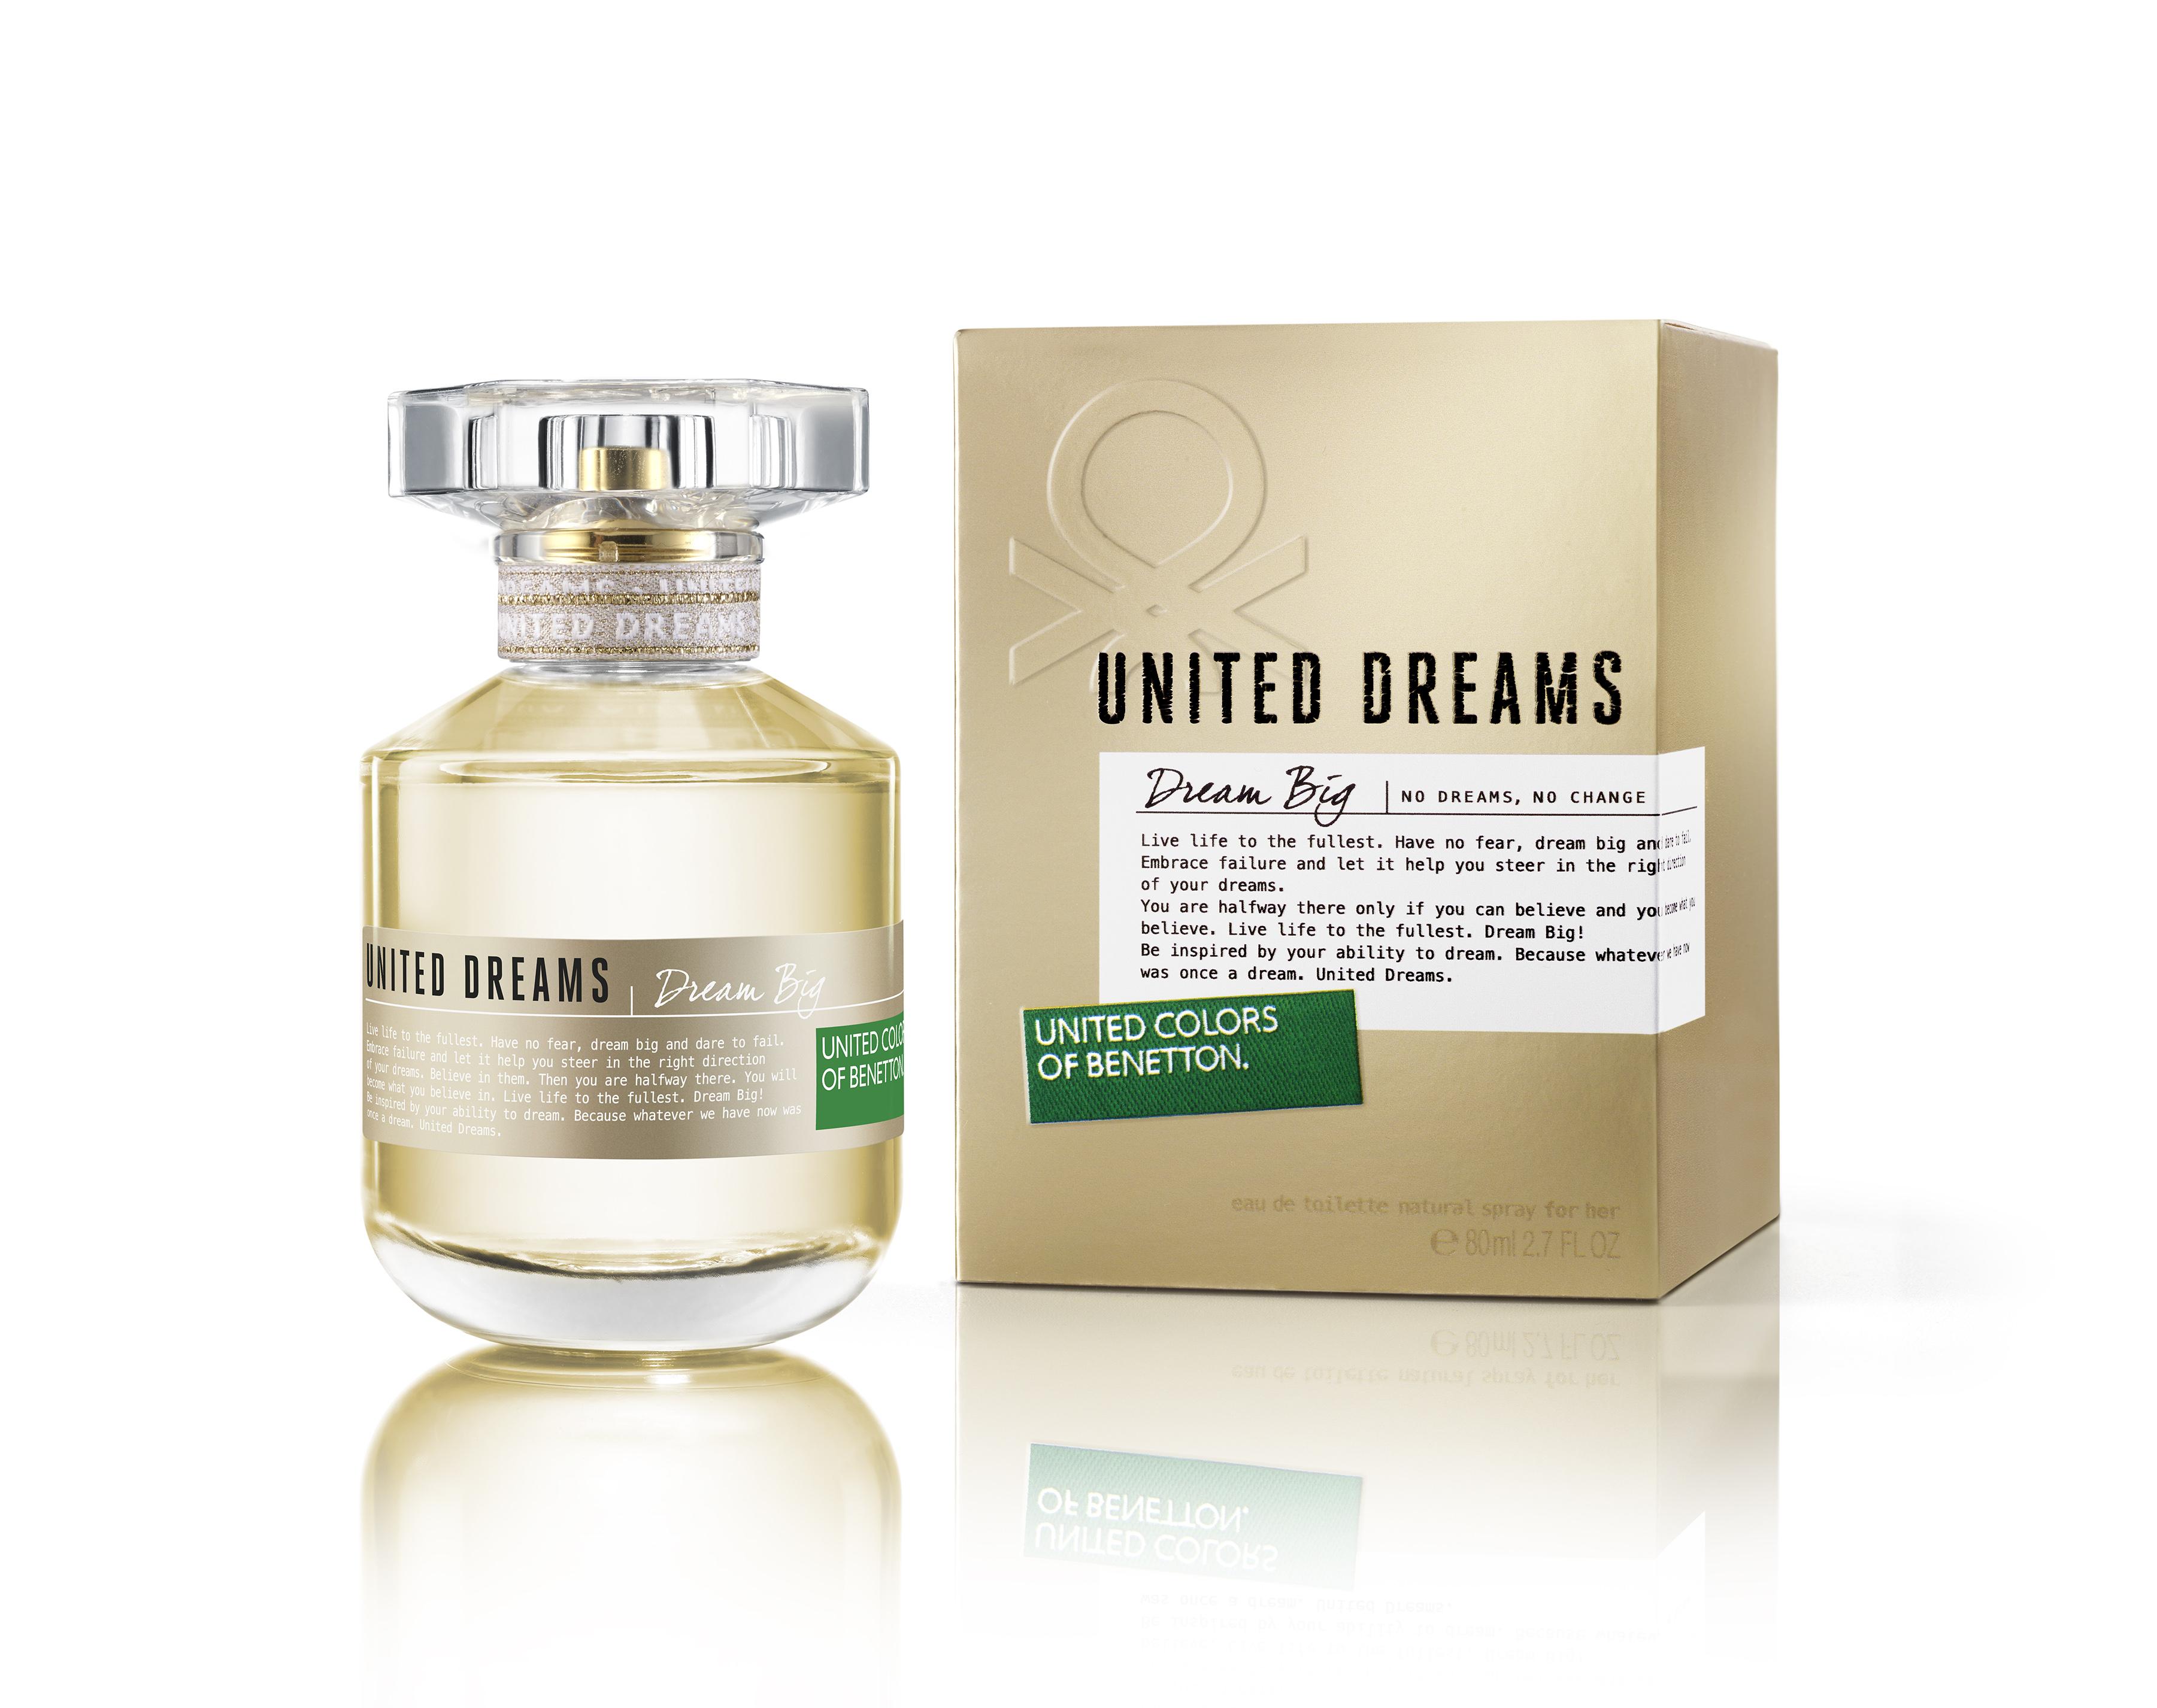 United Dreams Dream Big- Benetton United Dreams Dream Big-GoodGirlsCompany-parfum-Benetton parfum